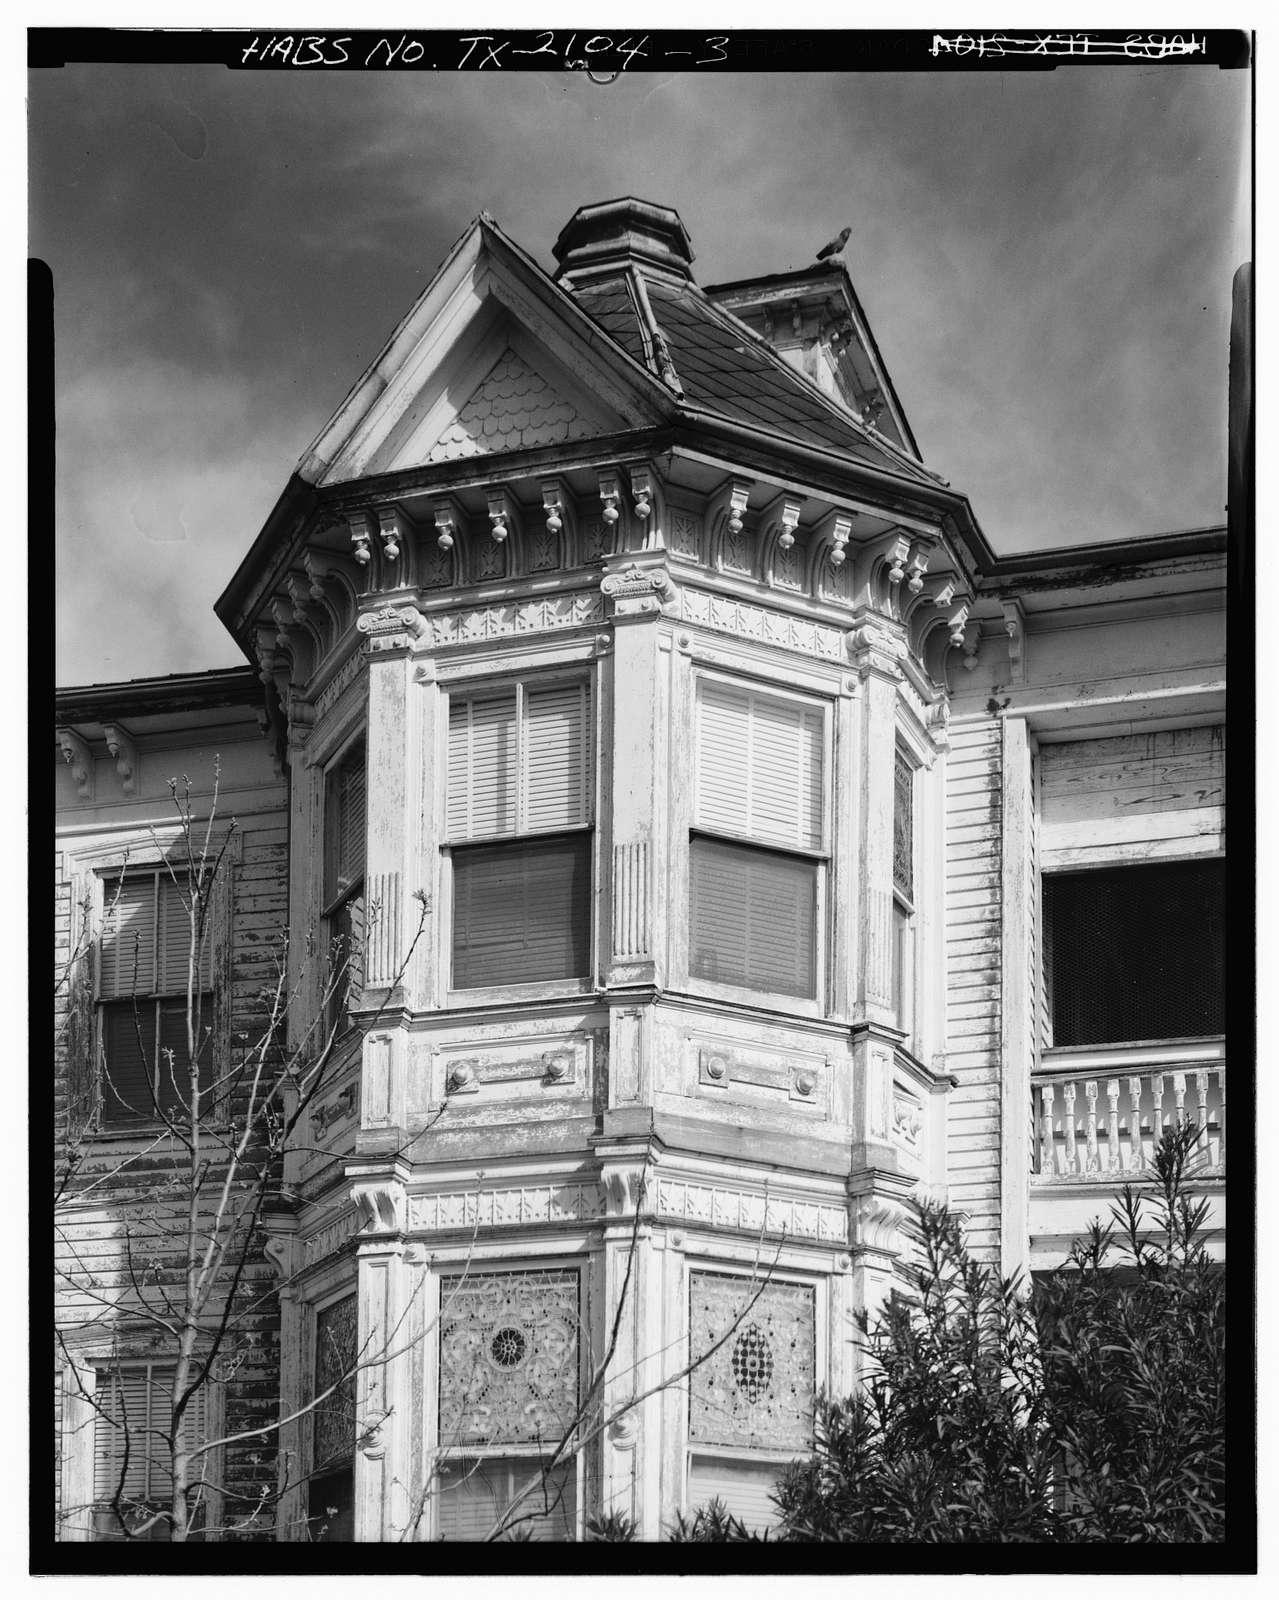 Mrs. John L. Darragh House, 519 Fifteenth Street, Galveston, Galveston County, TX